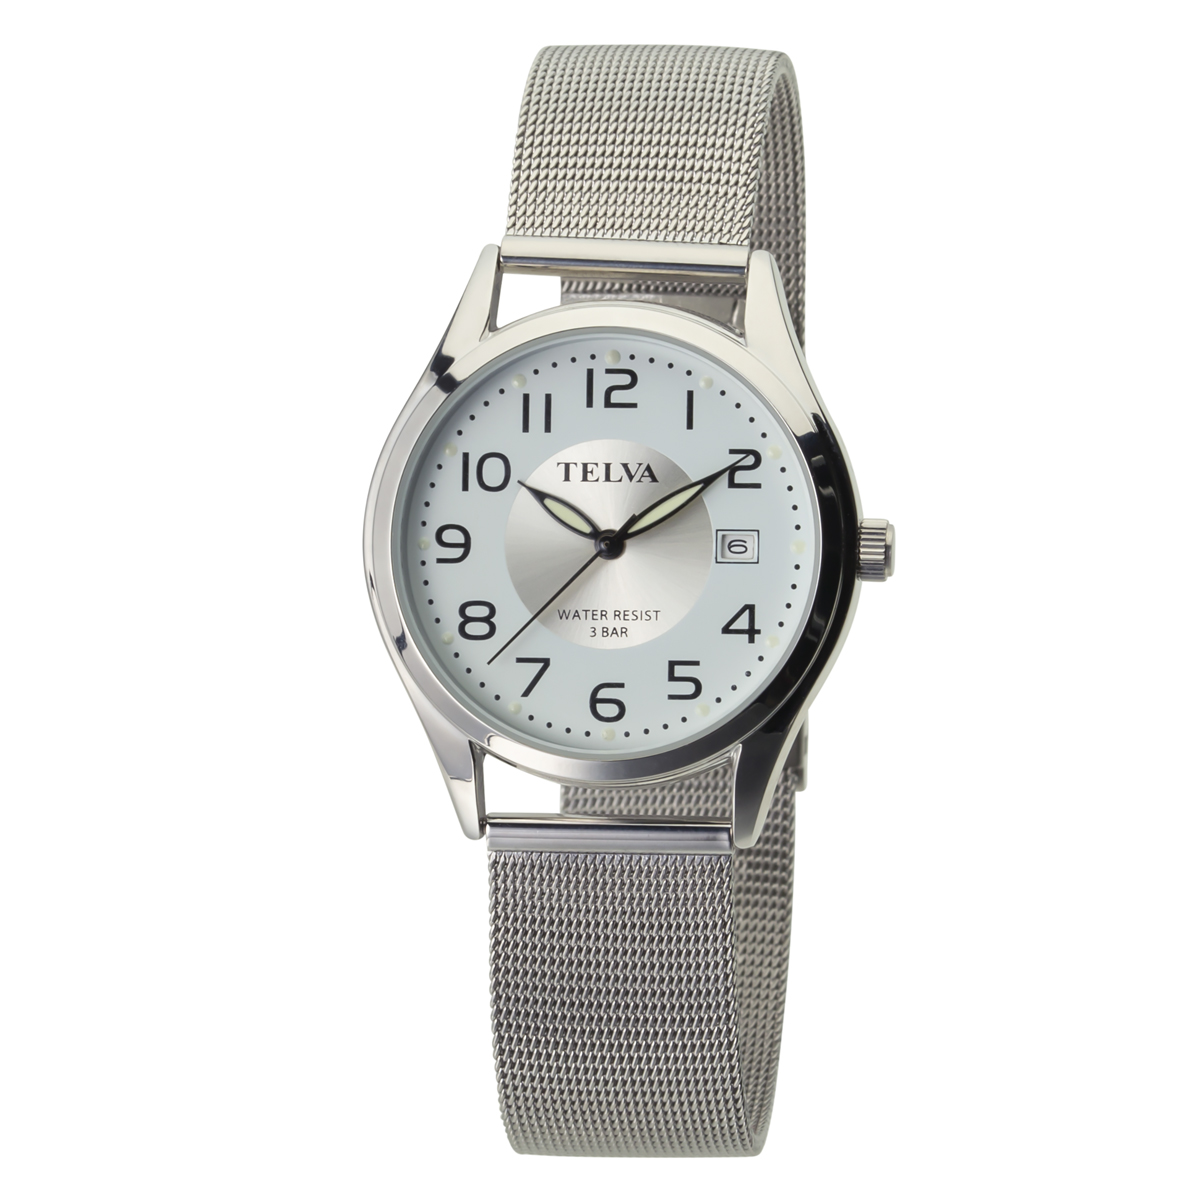 TELVA テルバ アナログウオッチ メンズ 腕時計 薄型針【TE-AM186】